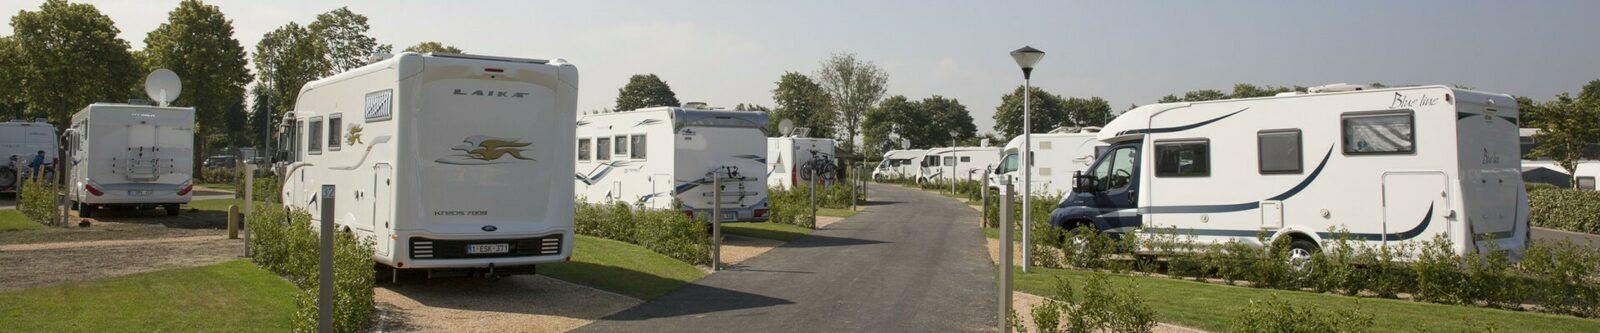 Camperplaats Kompas camping Nieuwpoort